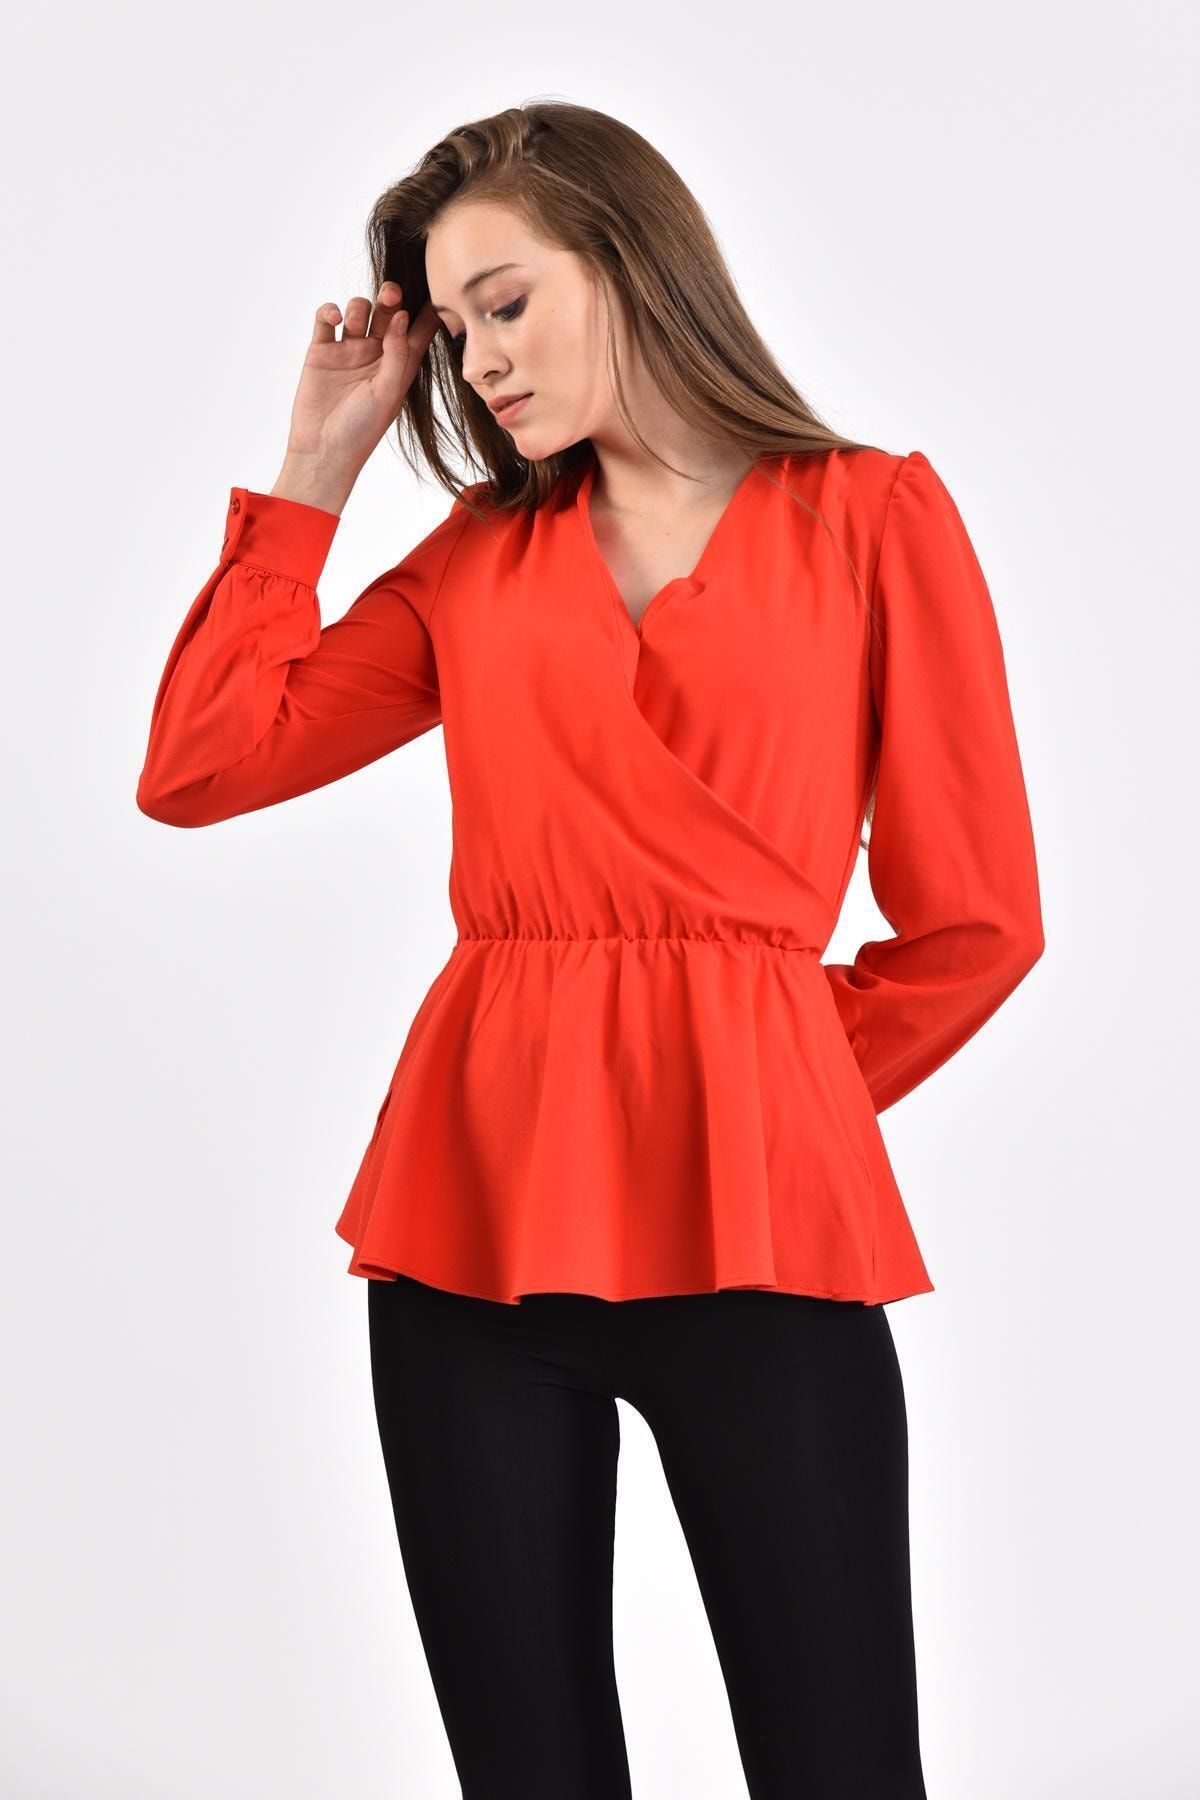 İroni Kadın Kırmızı Kruvaze Bluz 1